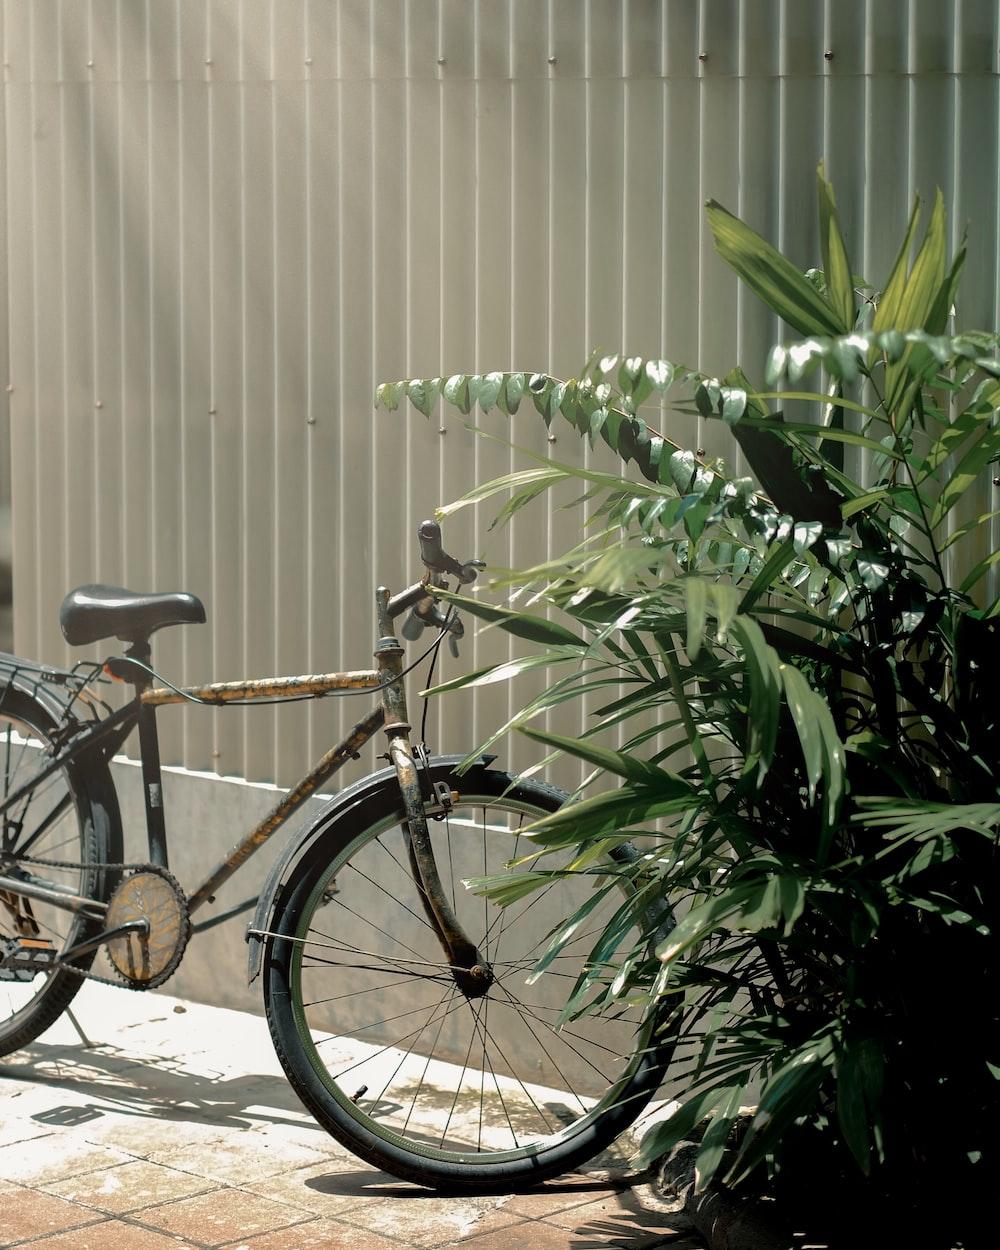 bicycle near plants